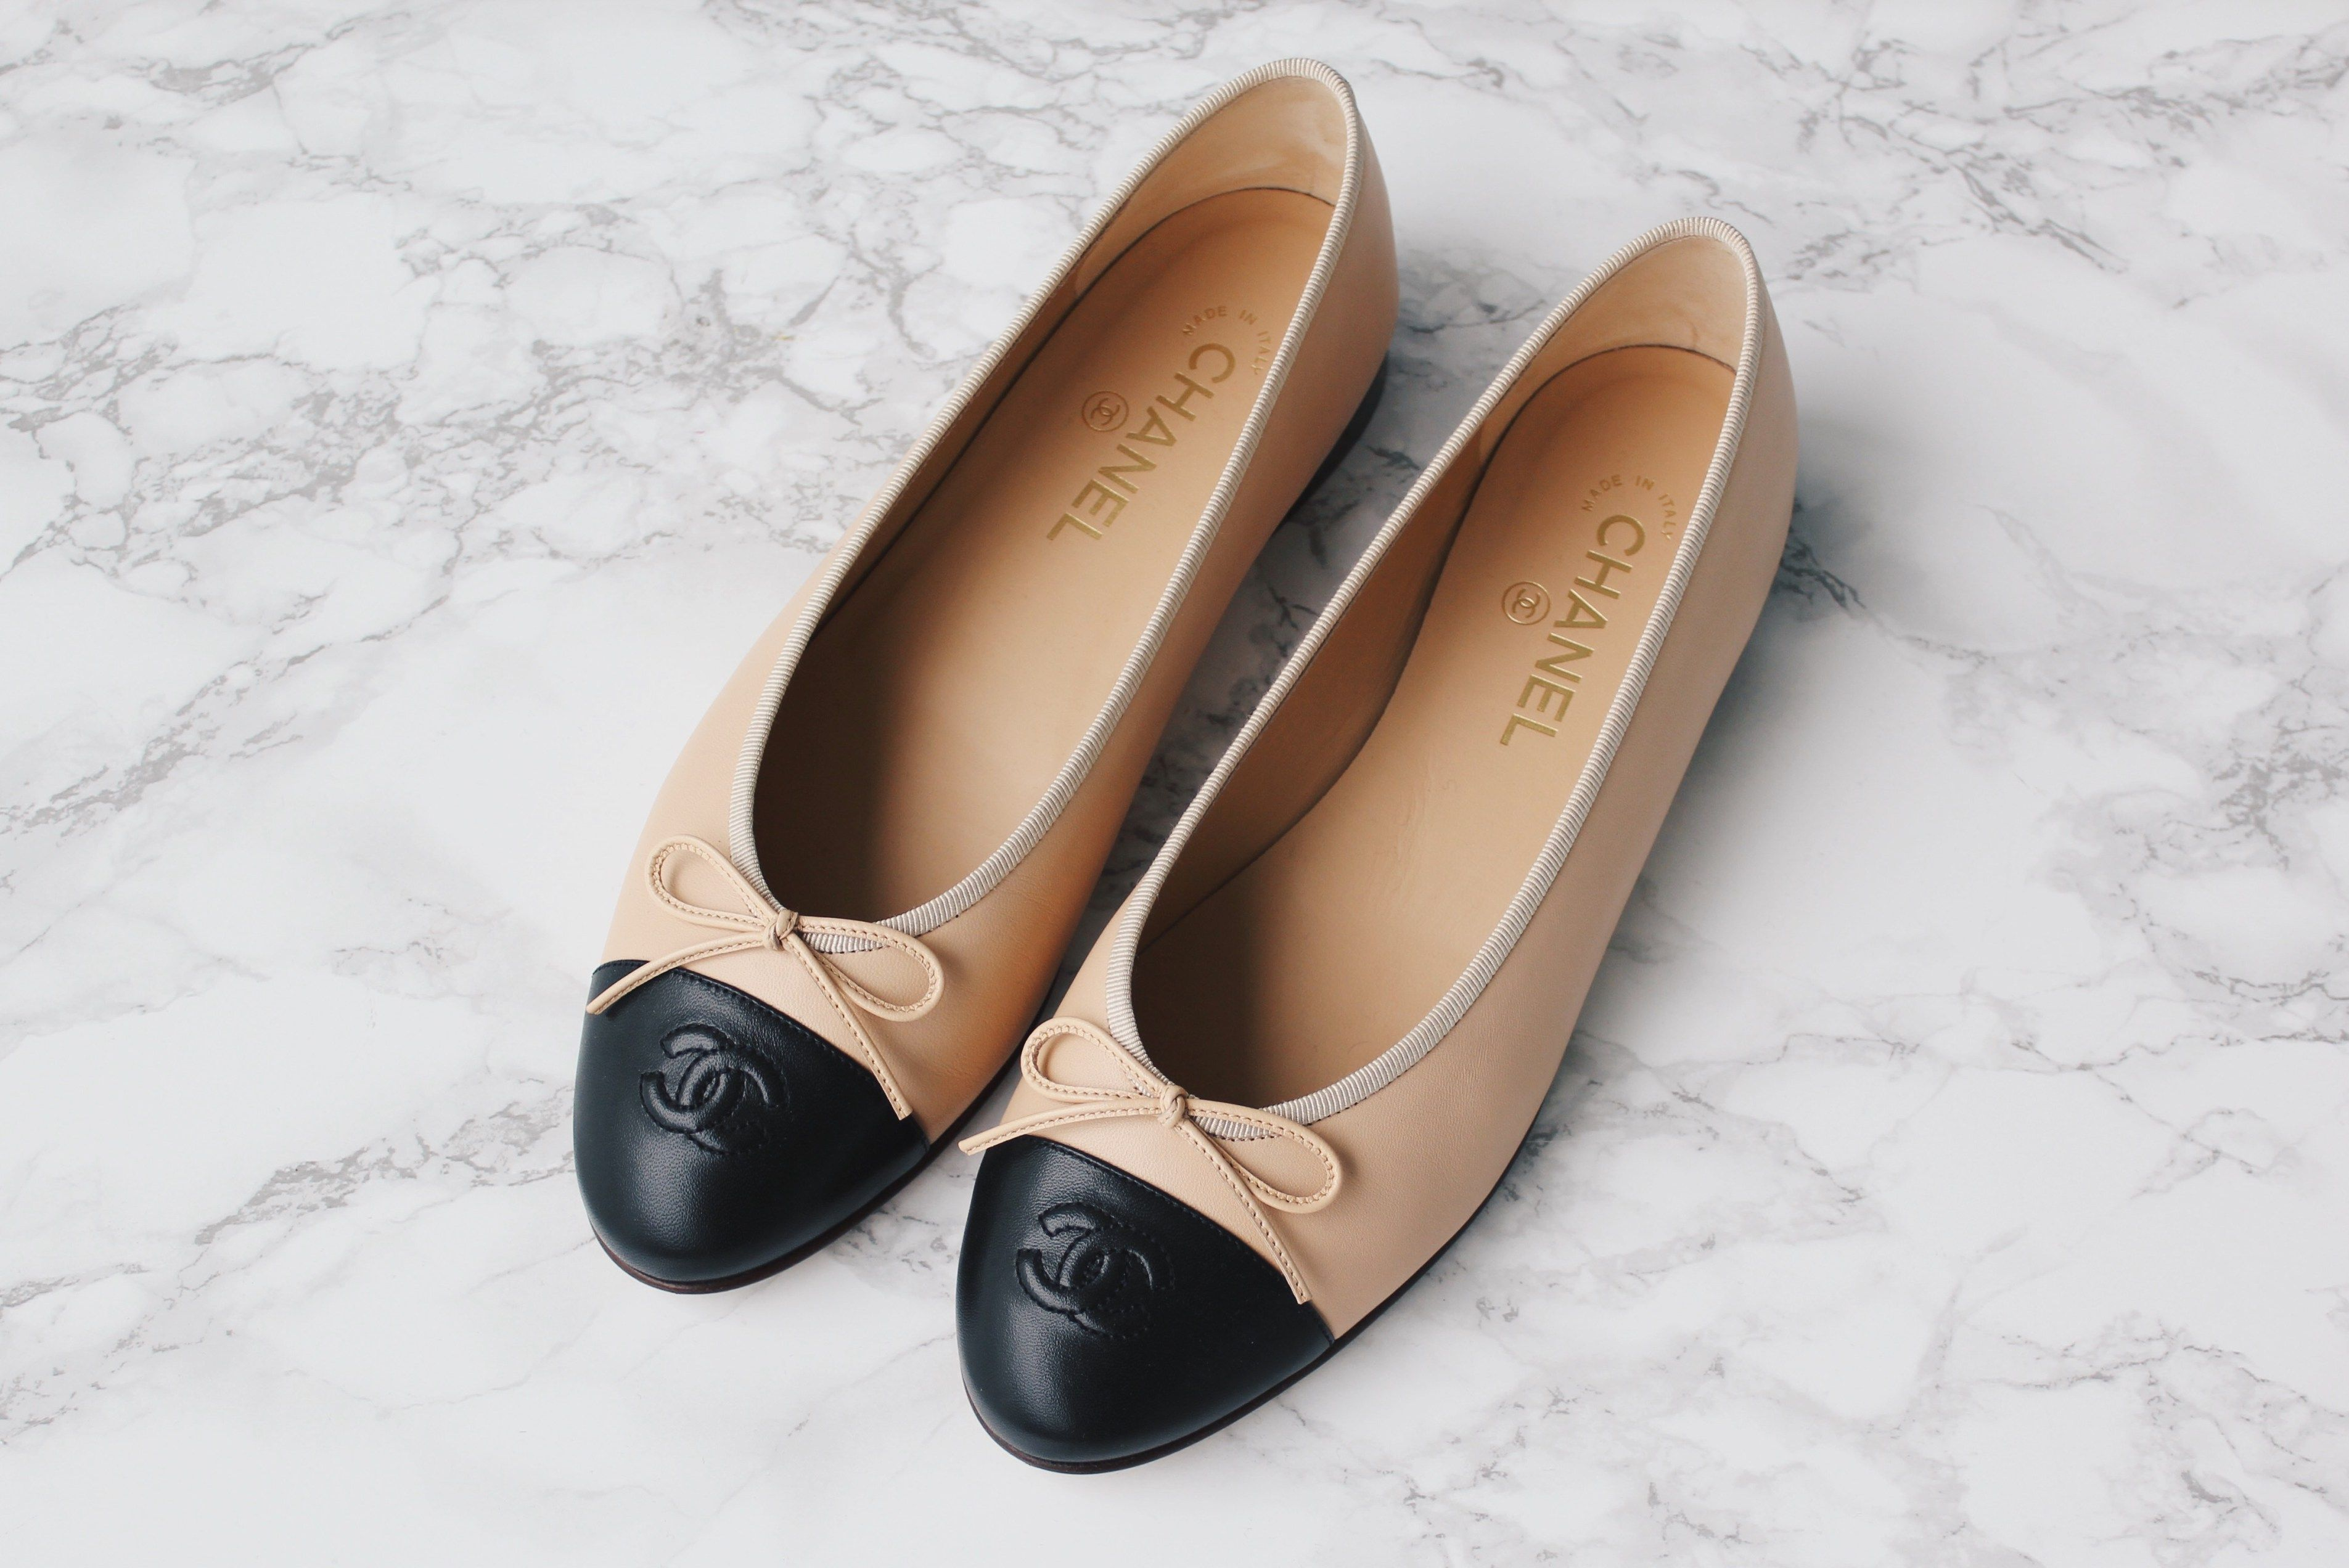 pretty nice 7aa94 e0e58 Chanel Flats / Ballerinas beige saansh.com | Shoes in 2019 ...